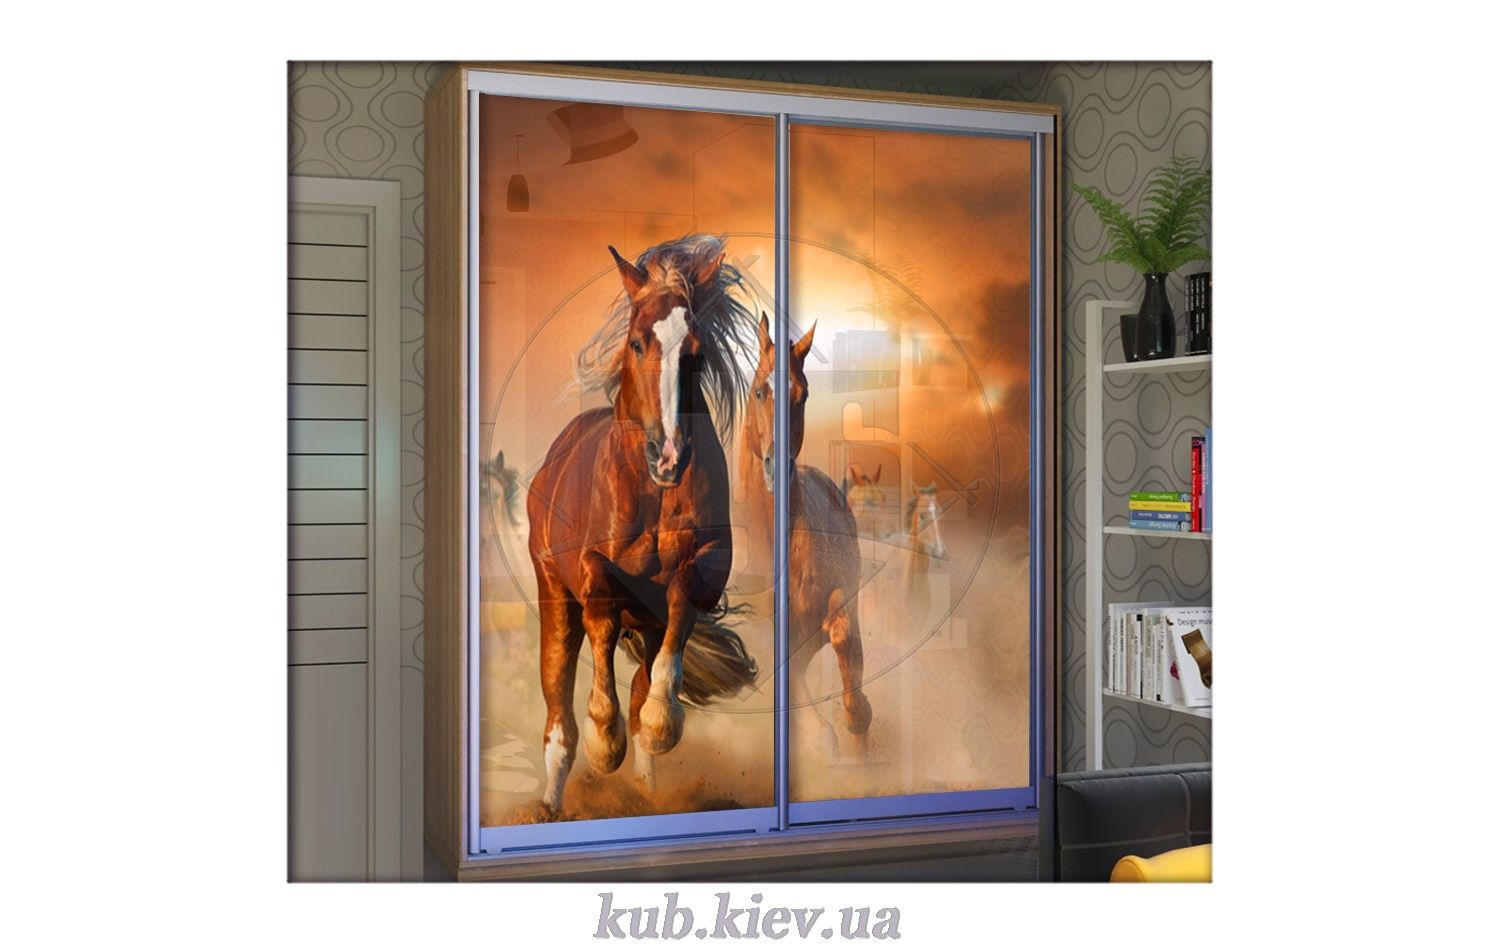 эти лошади на зеркале картинки золотые броши камнями